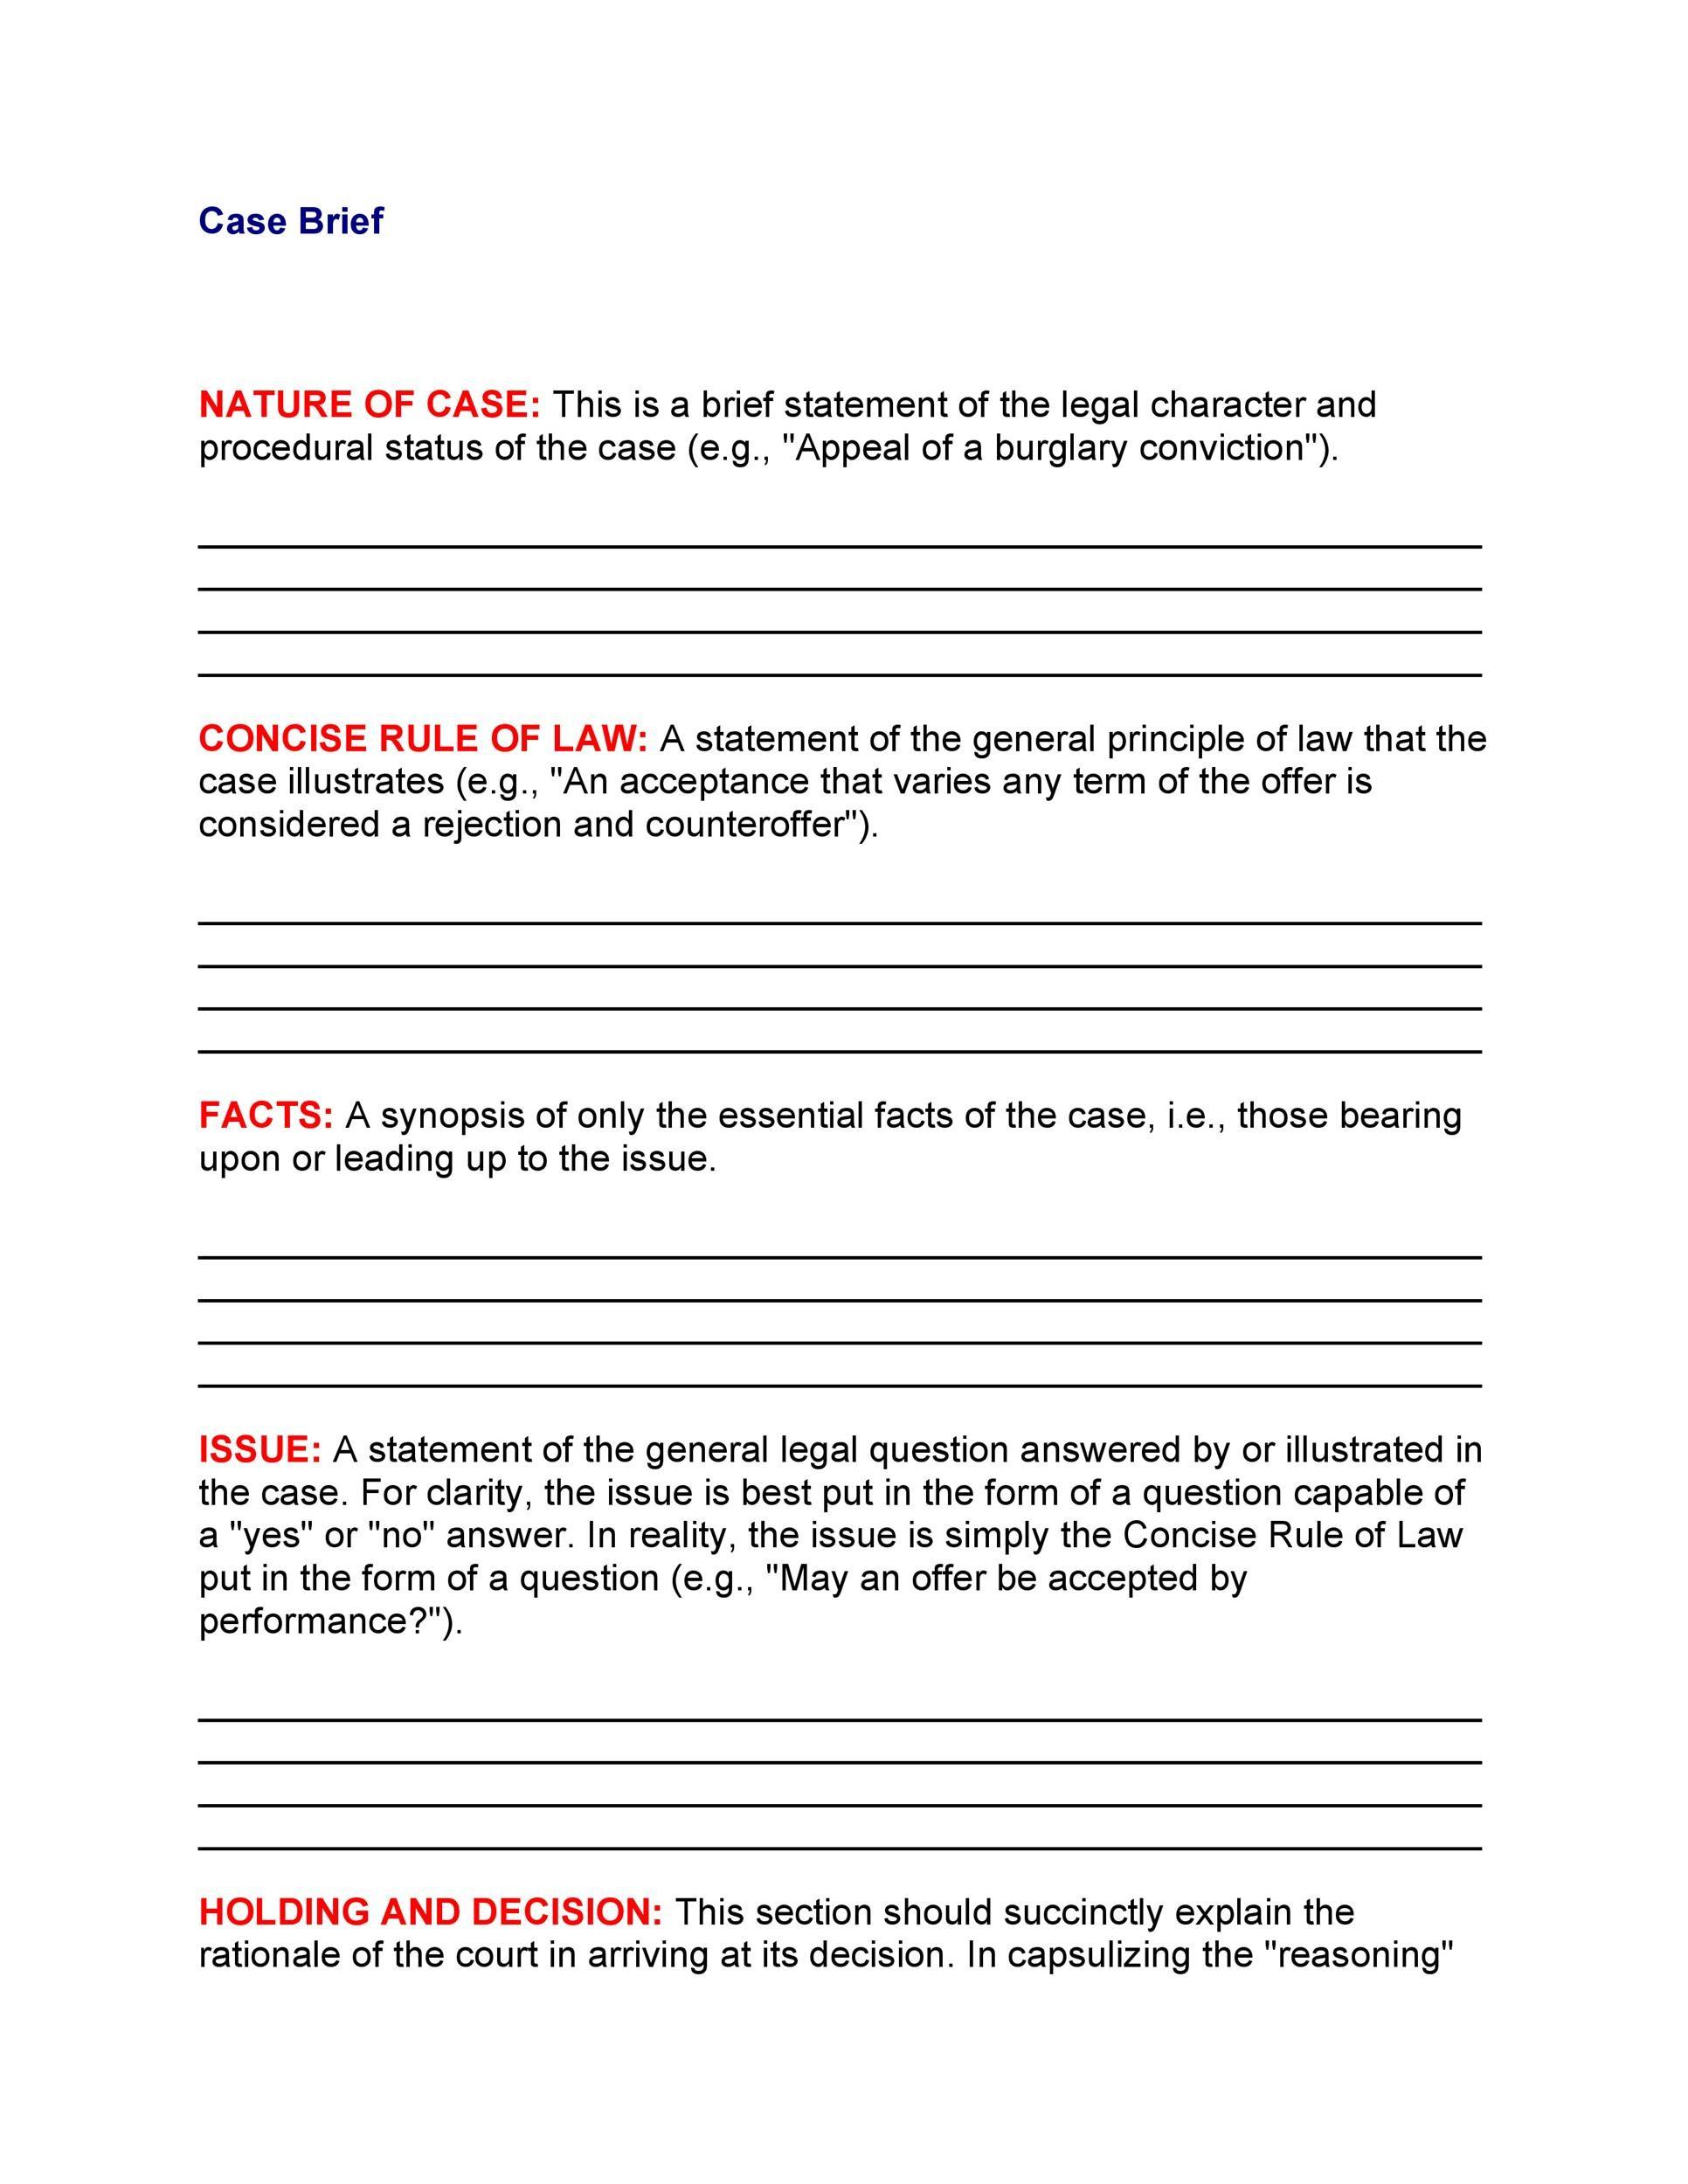 Free case brief template 20